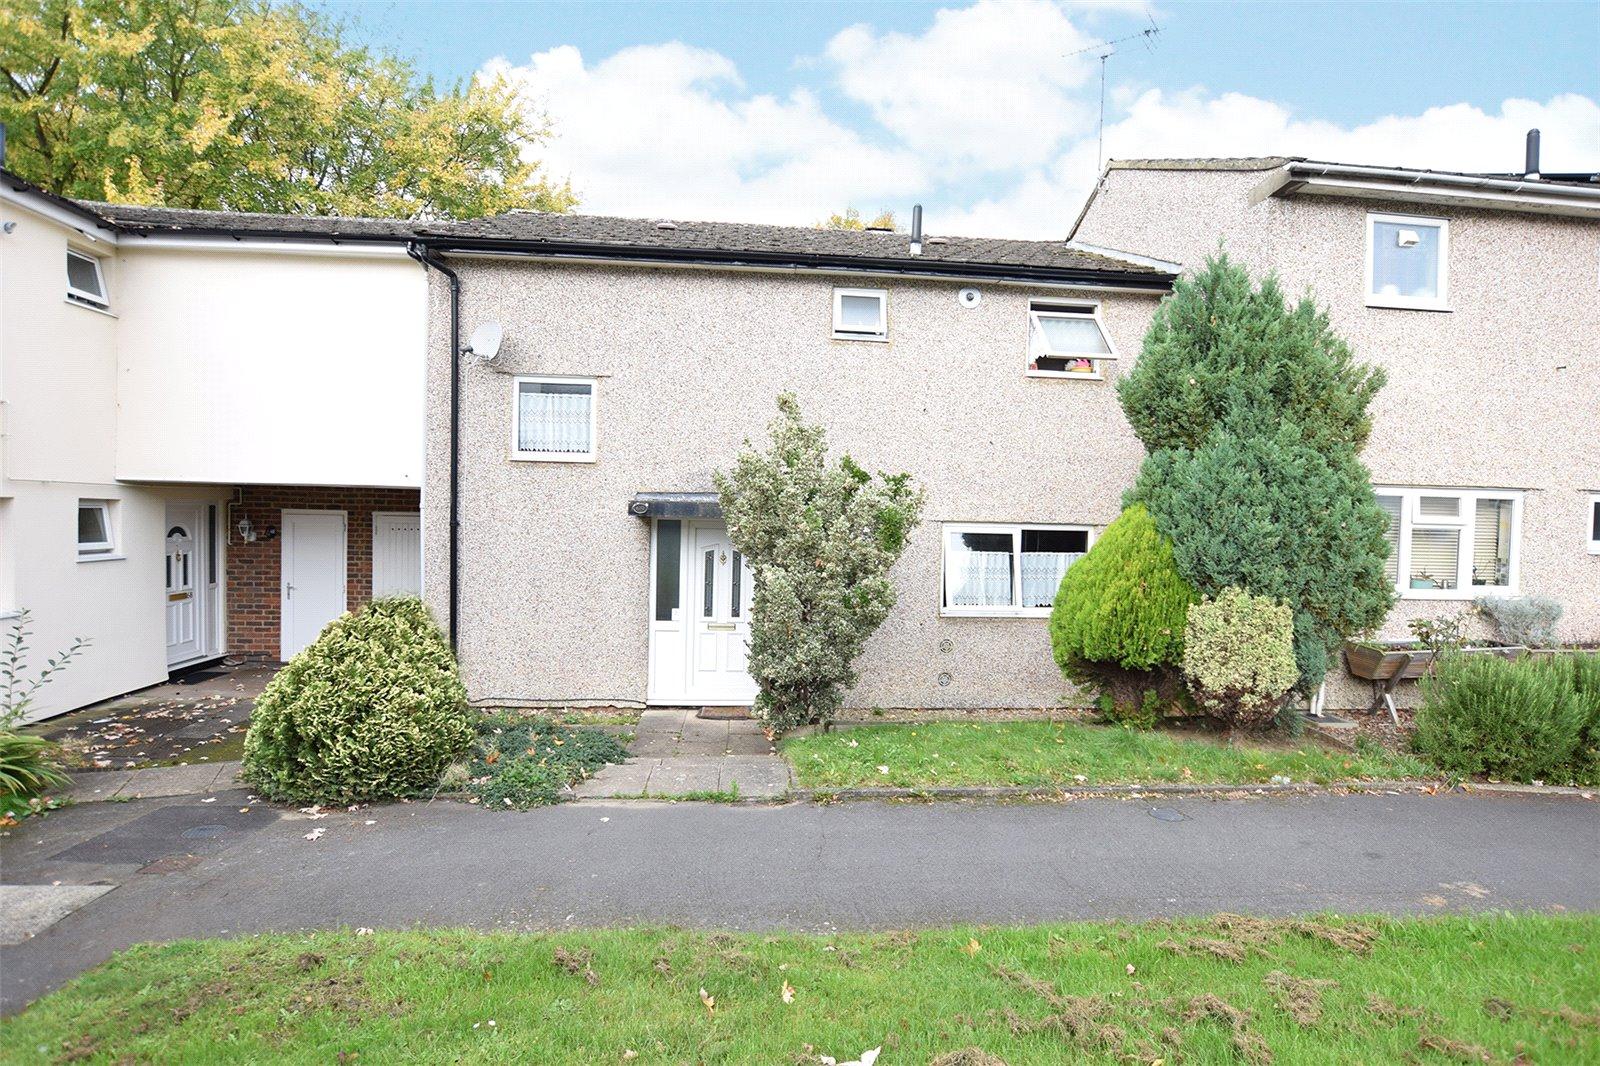 3 Bedrooms Terraced House for sale in Ennerdale, Bracknell, Berkshire, RG12